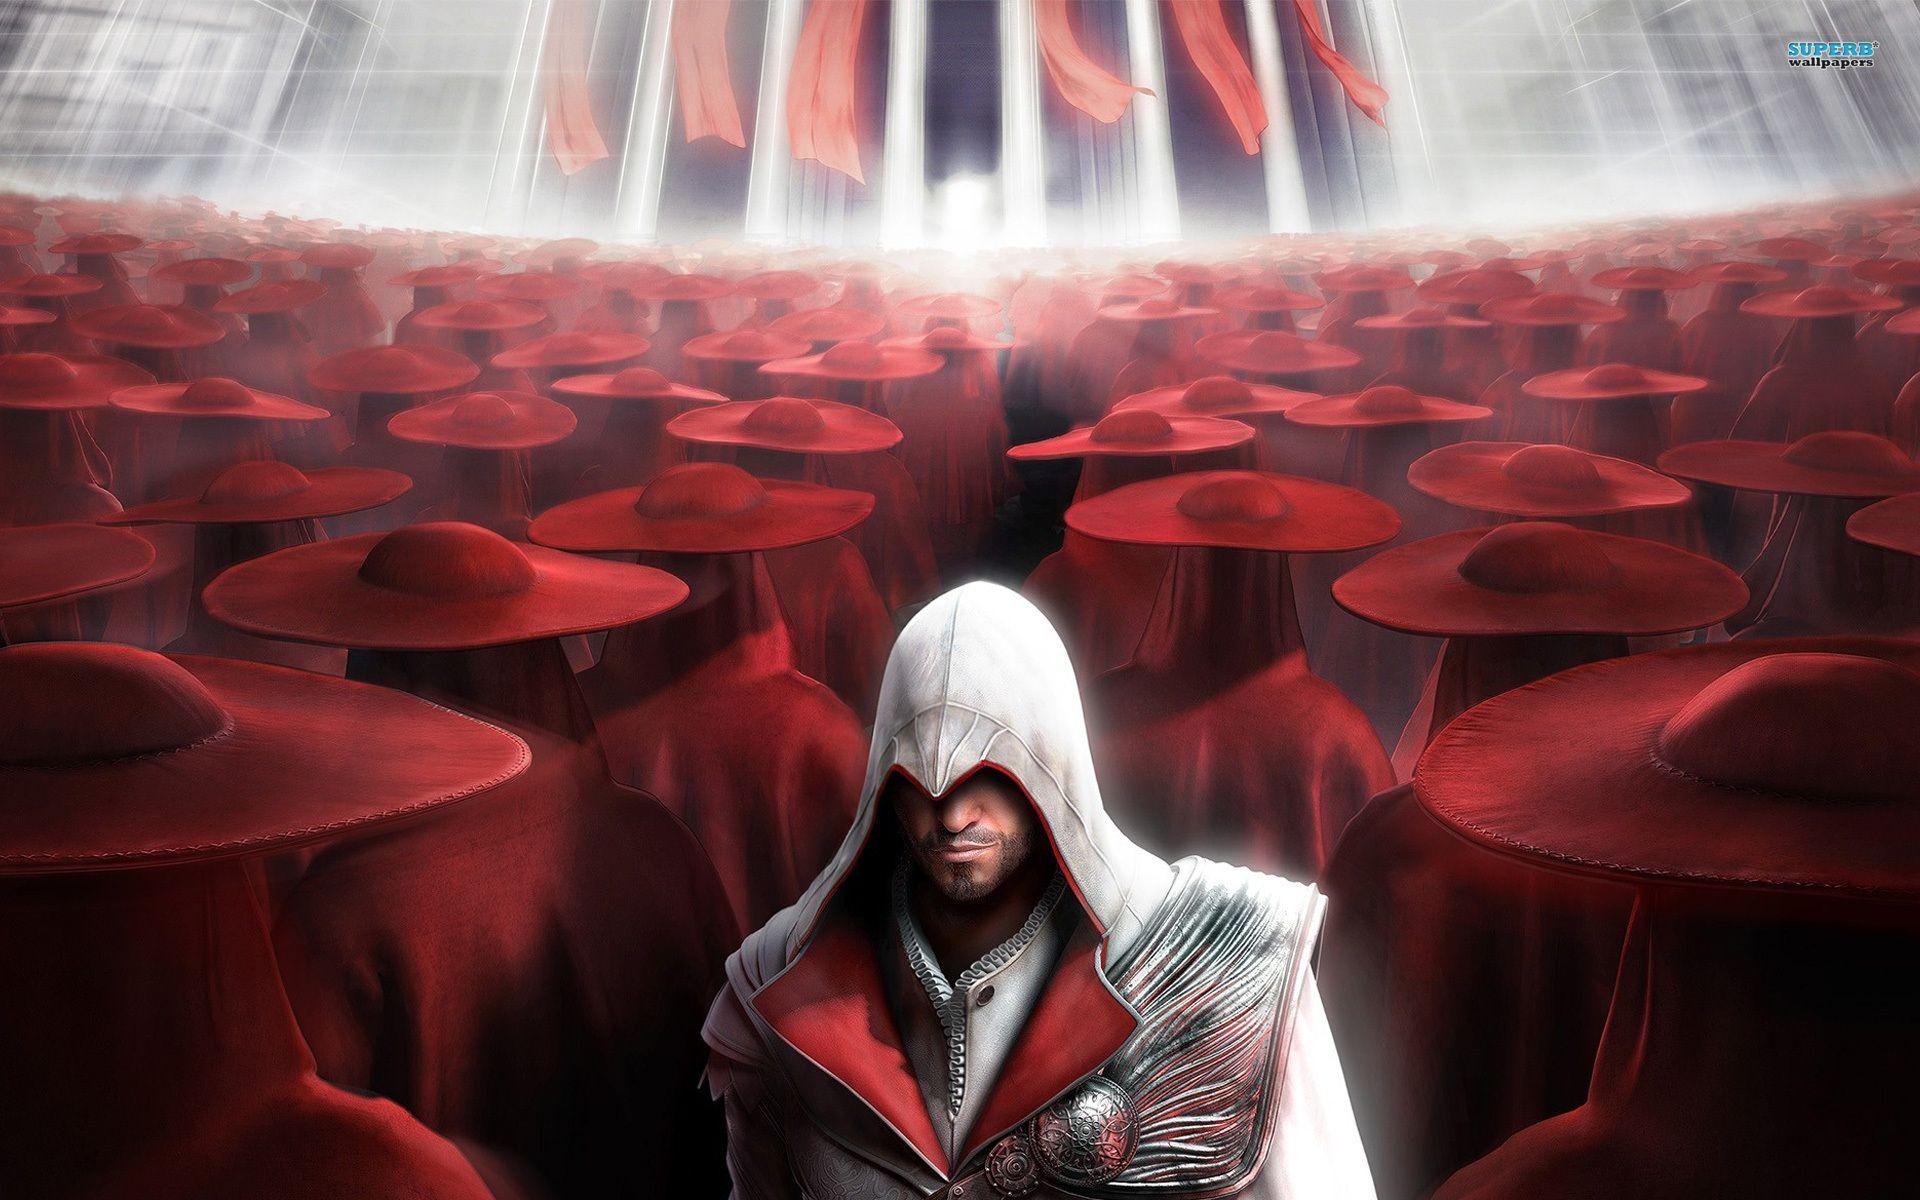 assassin's creed brotherhood | assassin's creed: brotherhood